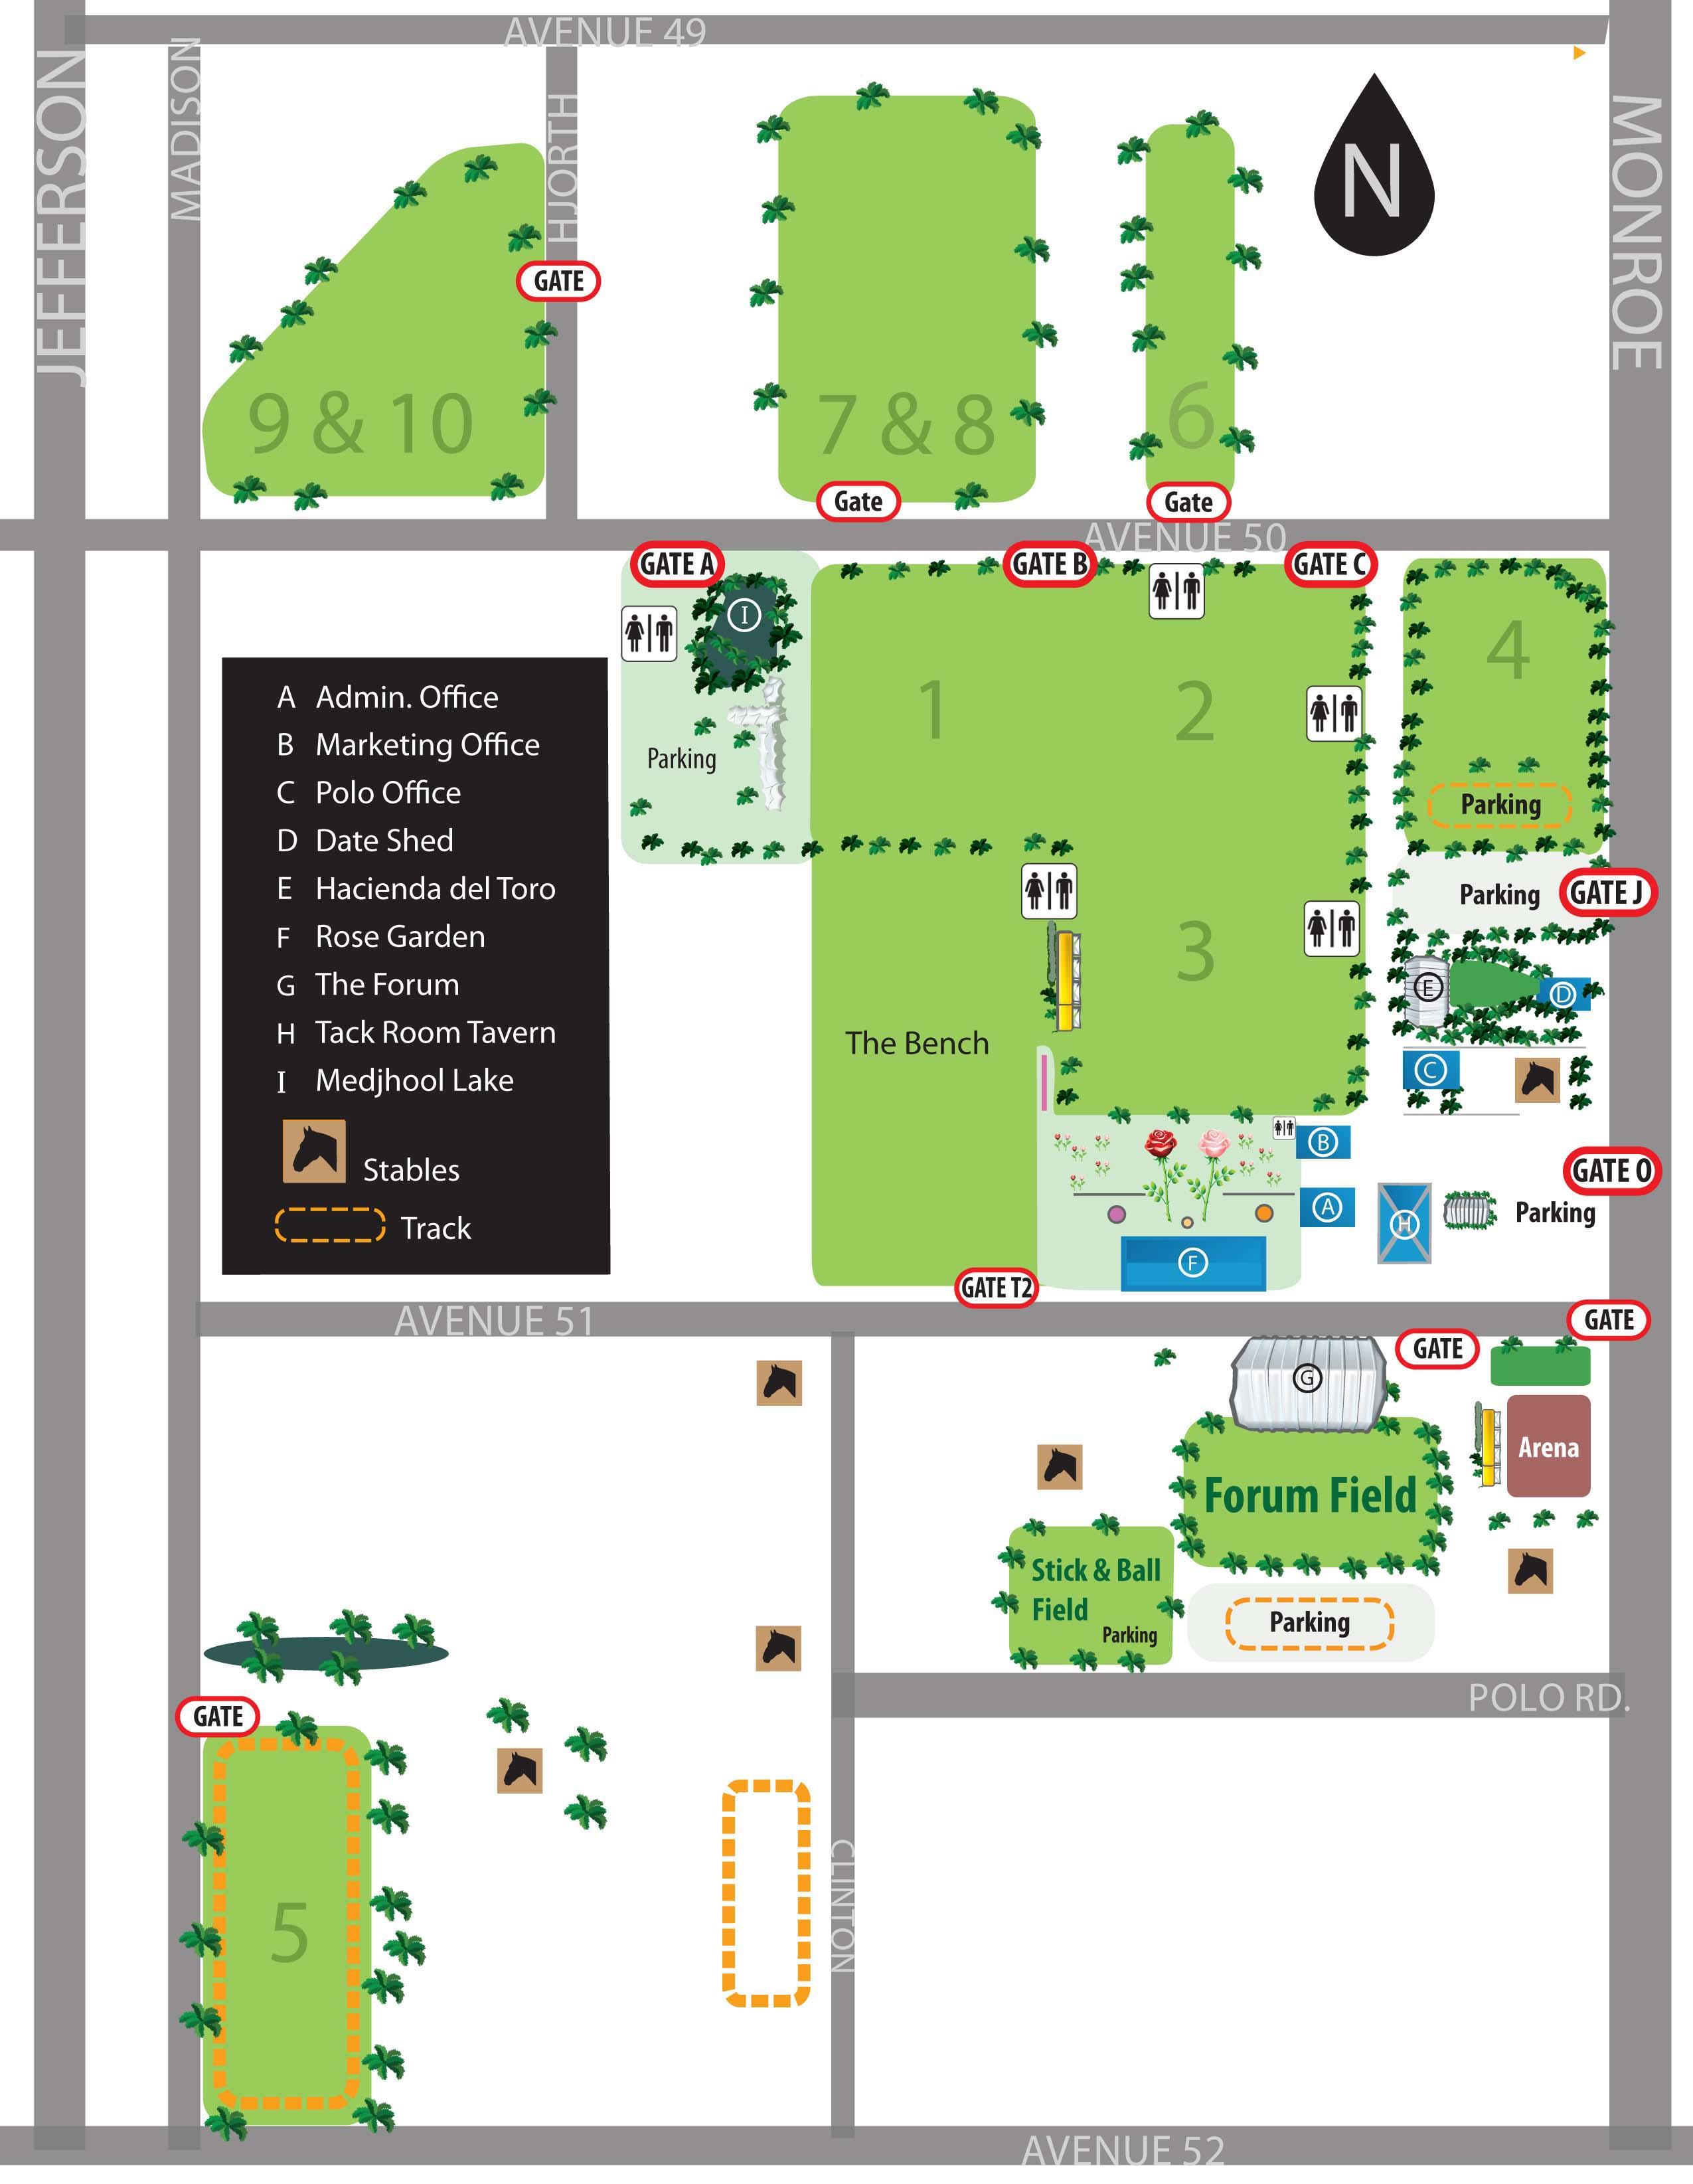 Field Locations Map - Empire Polo Club